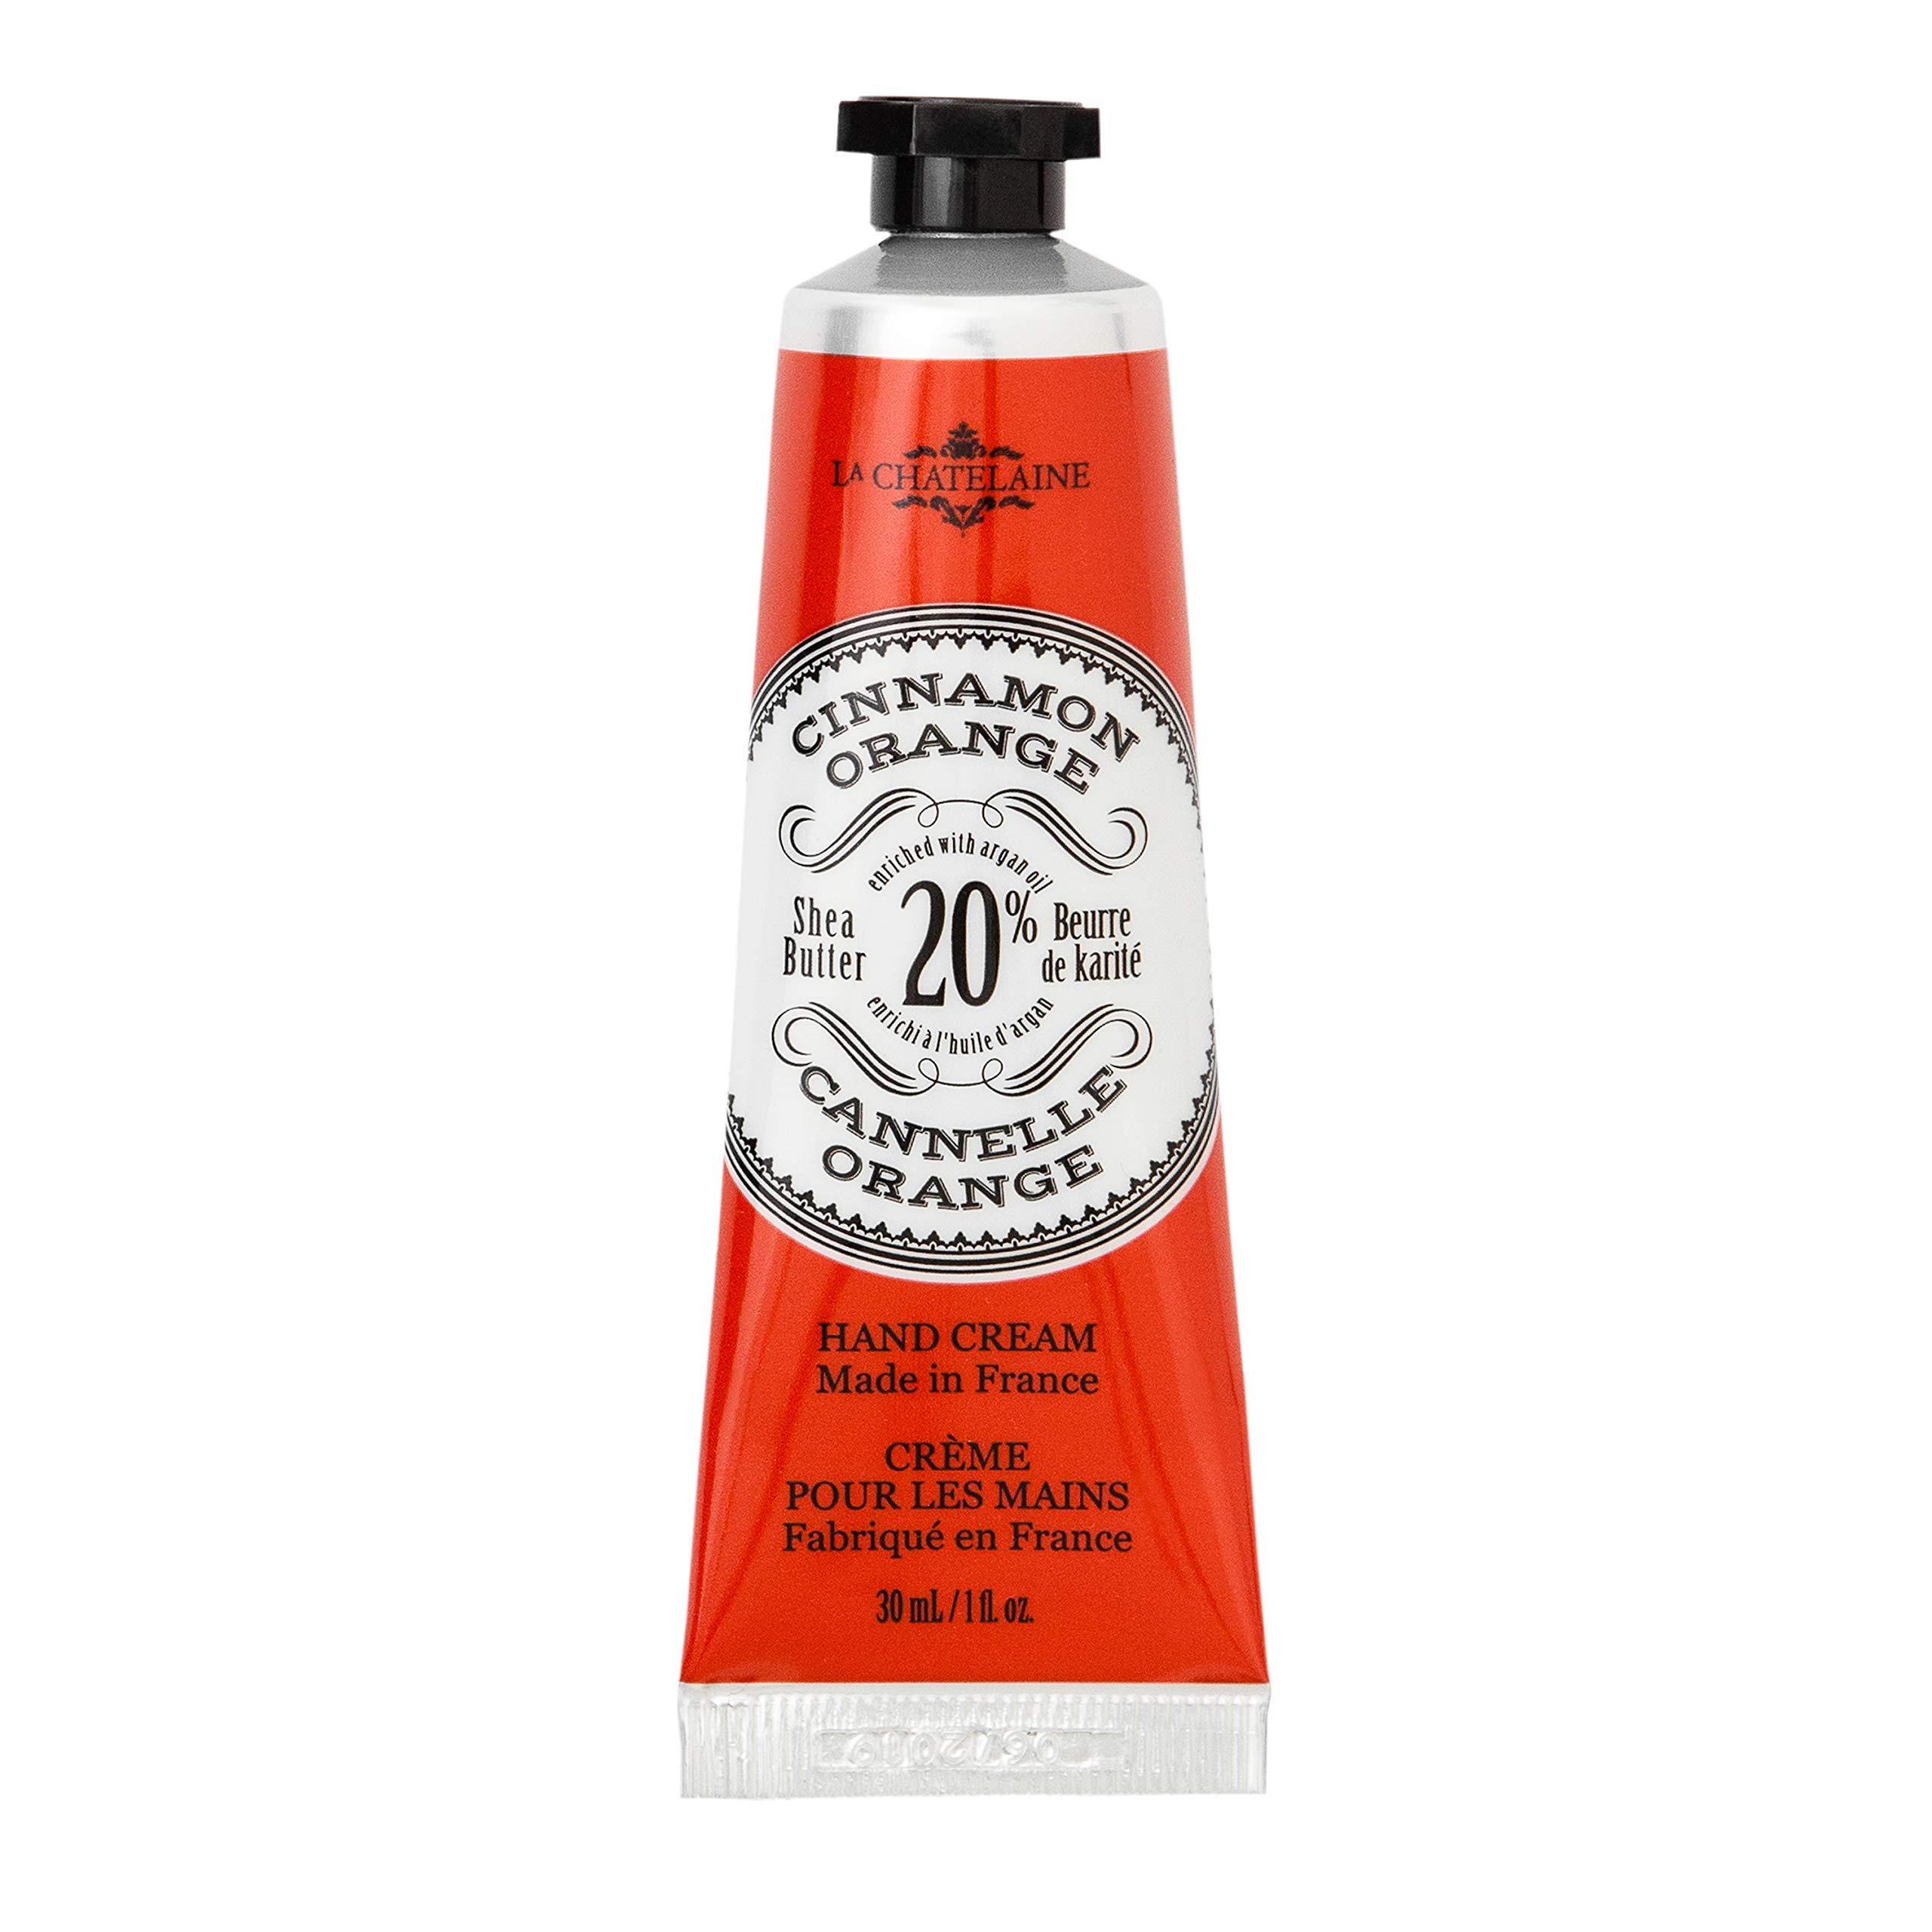 La Chatelaine 20% Shea Butter Hand Cream Cinnamon Orange Travel Size 1 oz, Organic Argan Oil, Moisturizing, Nourishing, Repairing, Extra-Rich Hand Lotion, Made in France, Paraben Free